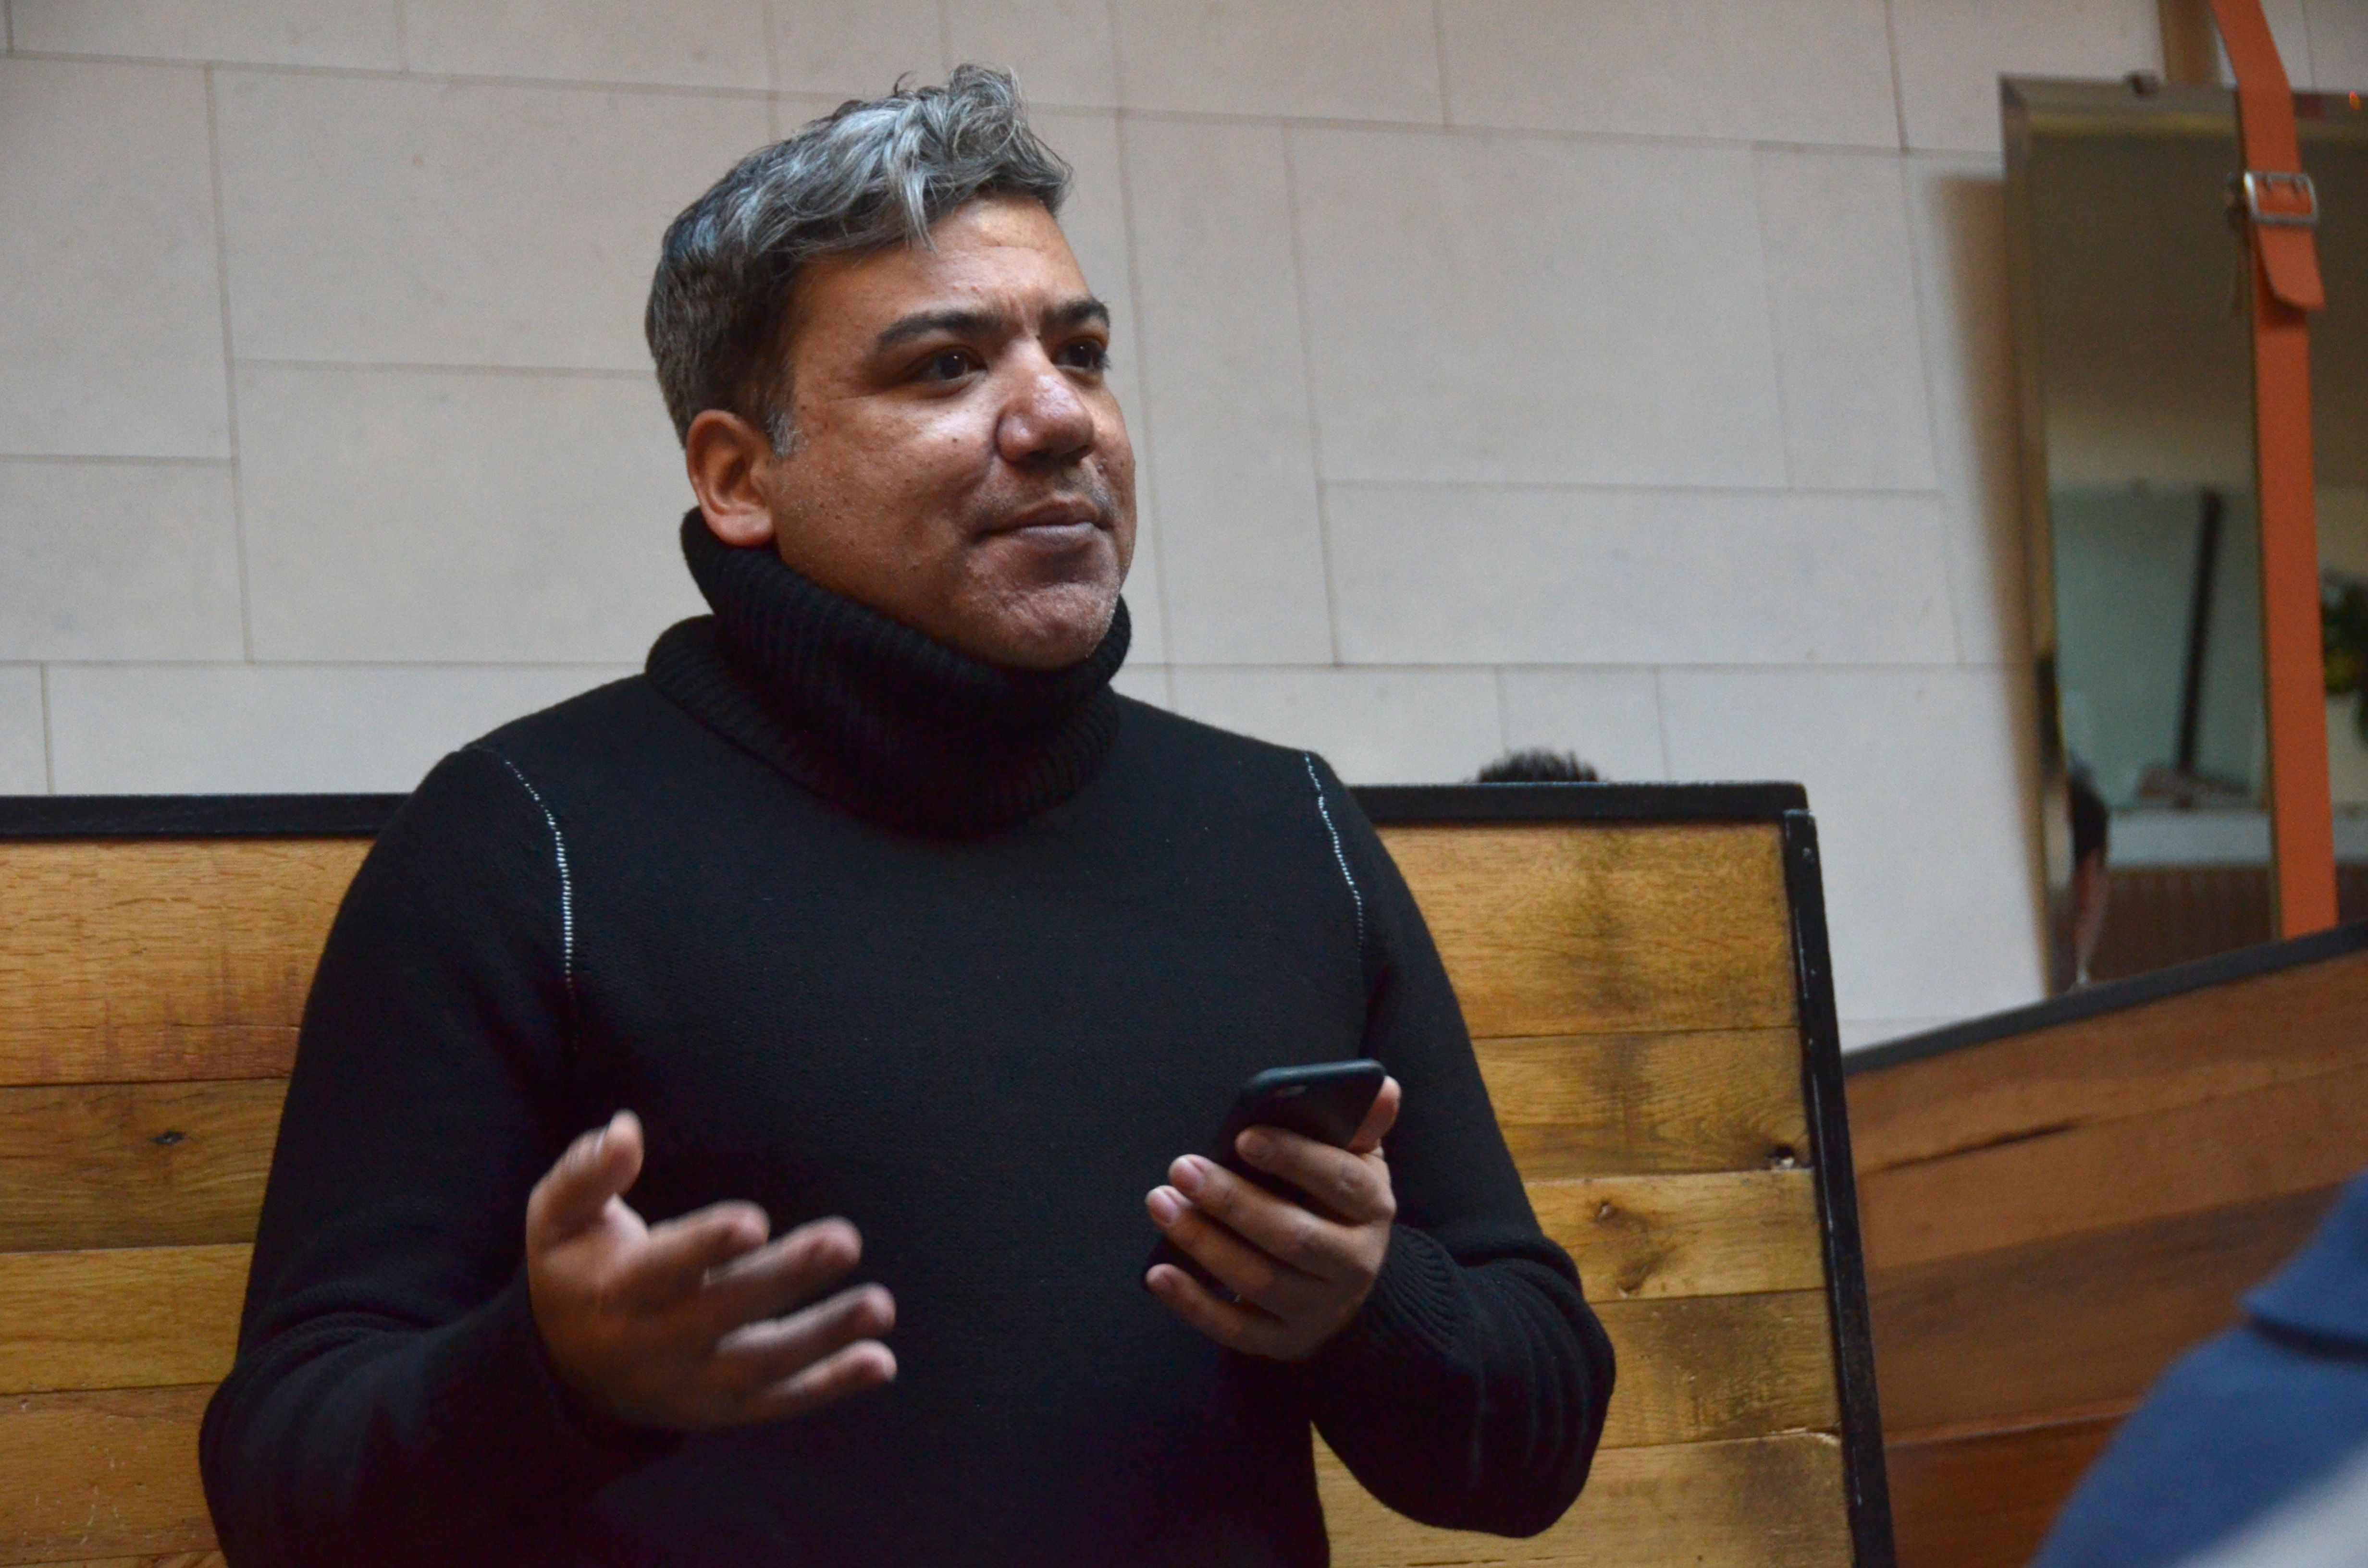 Eugene Hernandez, Deputy Director, Film Society of Lincoln Center, shares some remarks